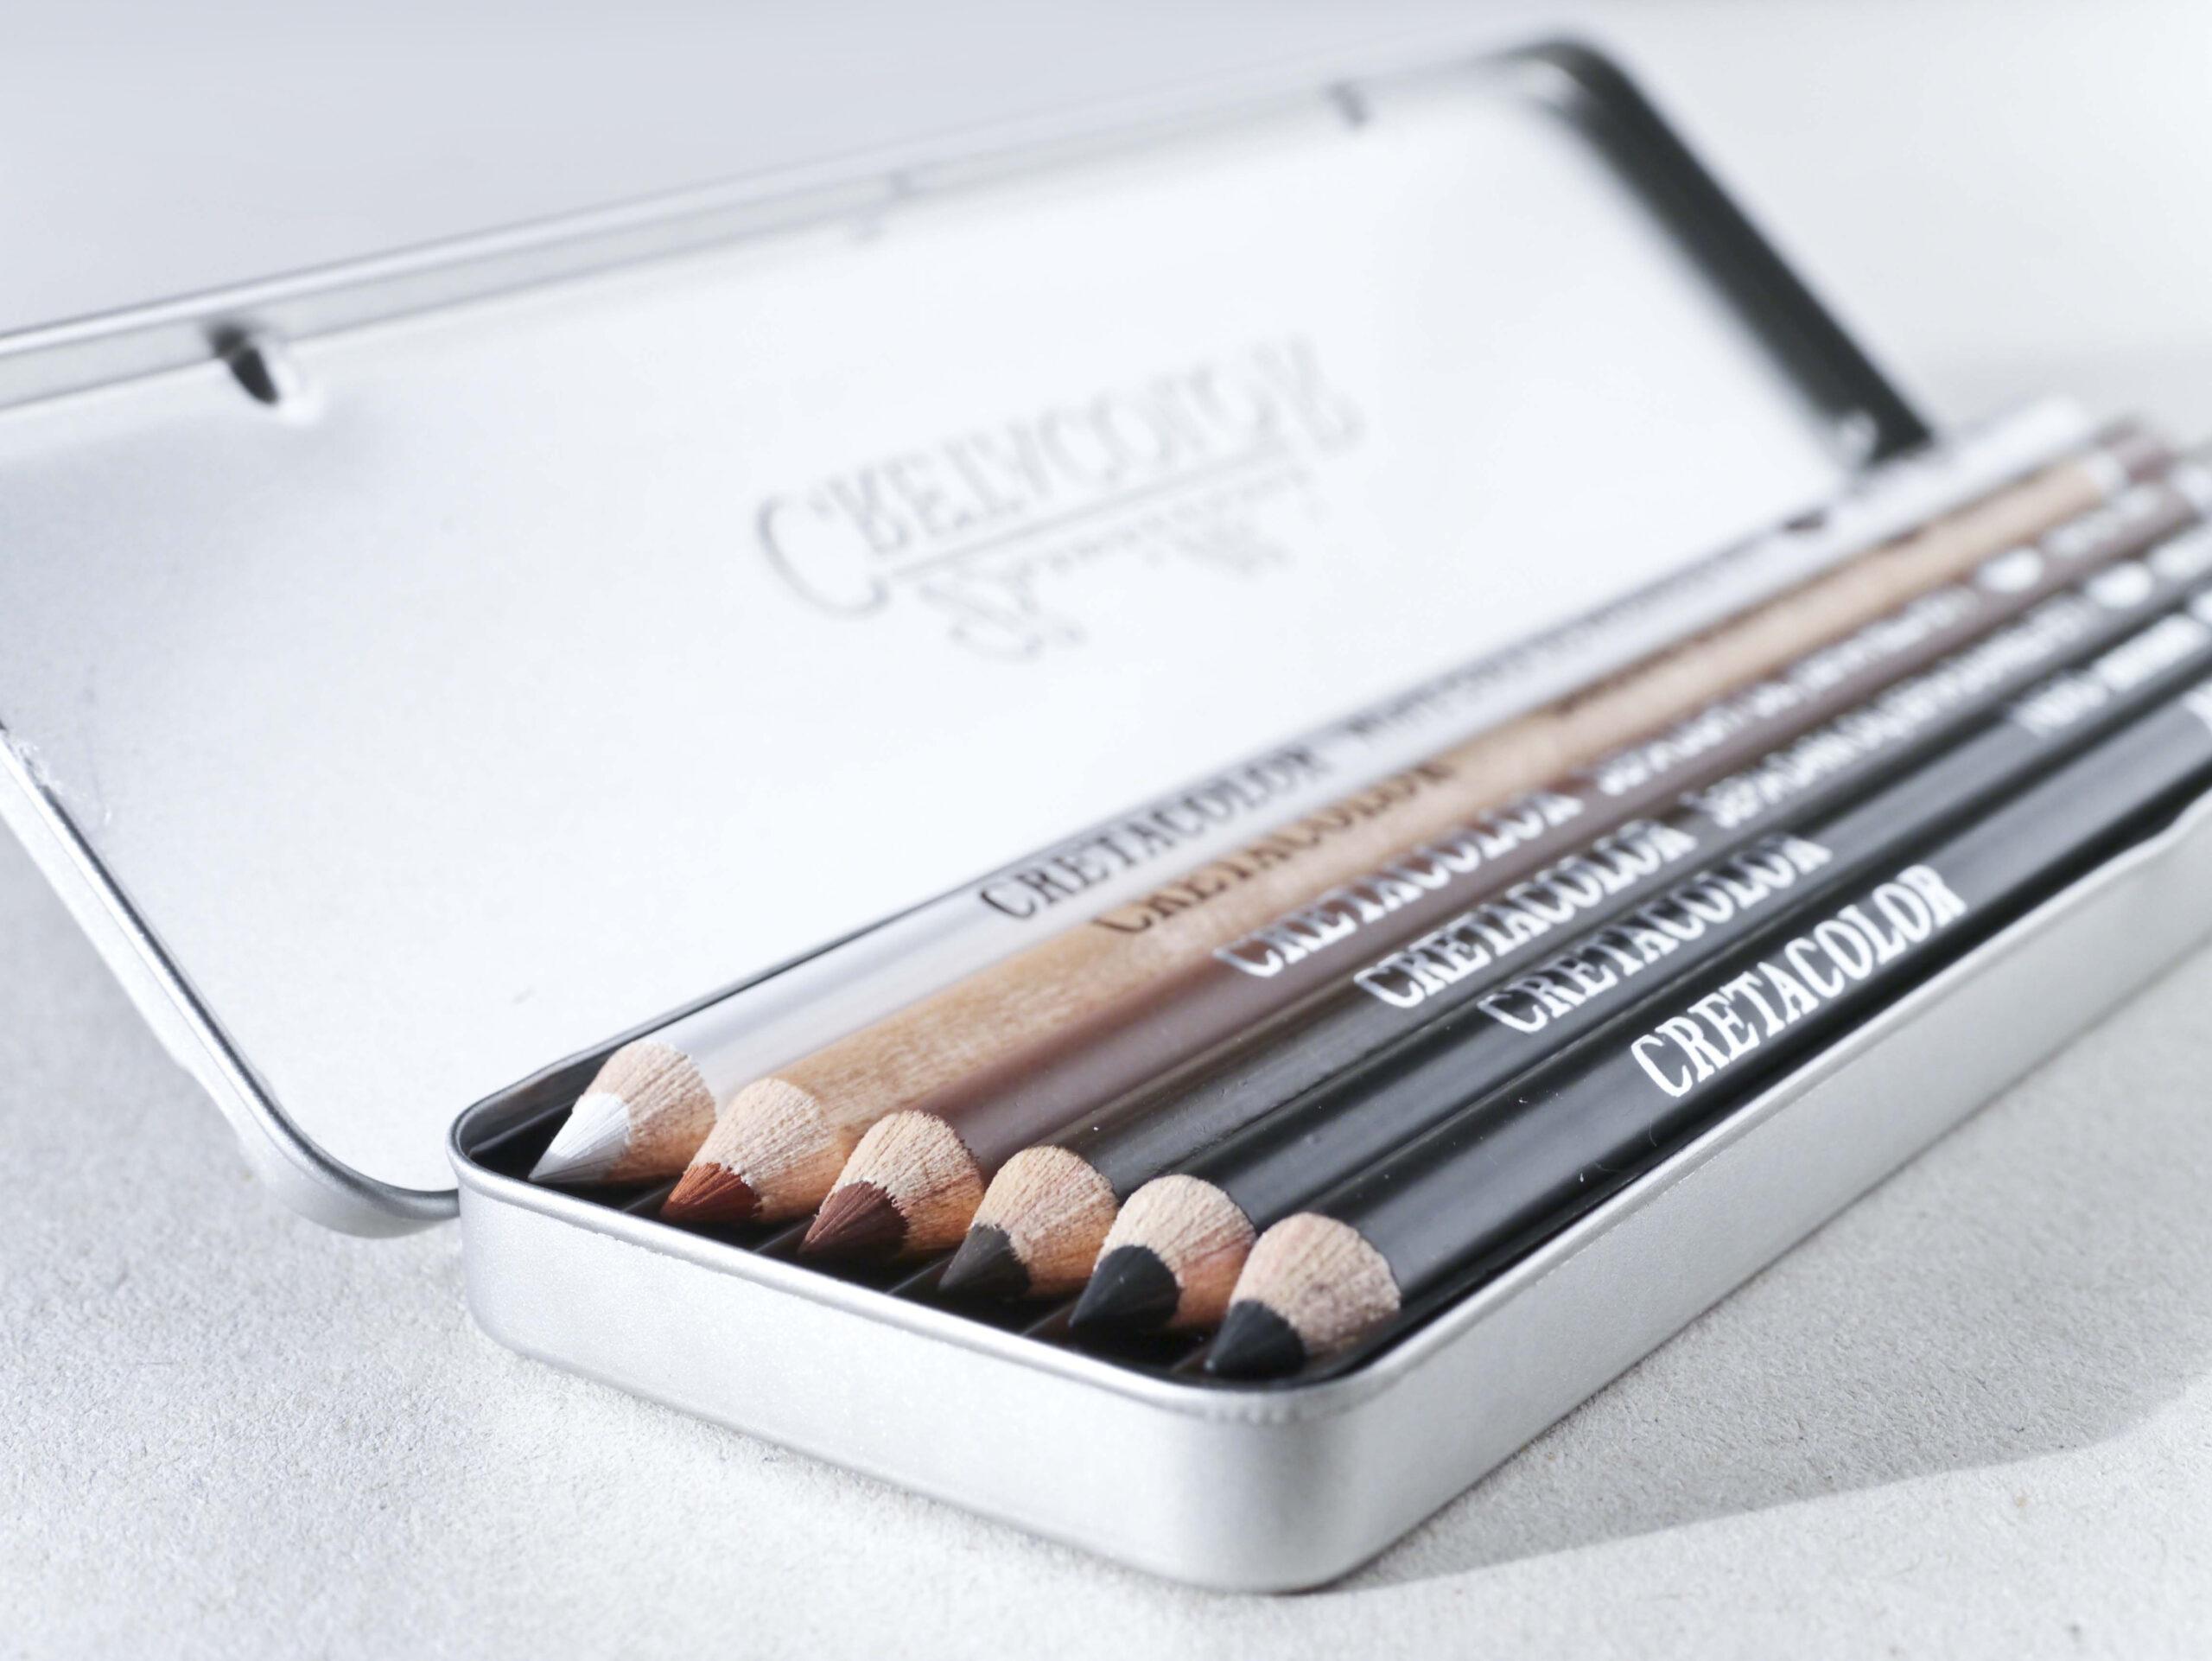 Cretacolor Oil Pencil Set